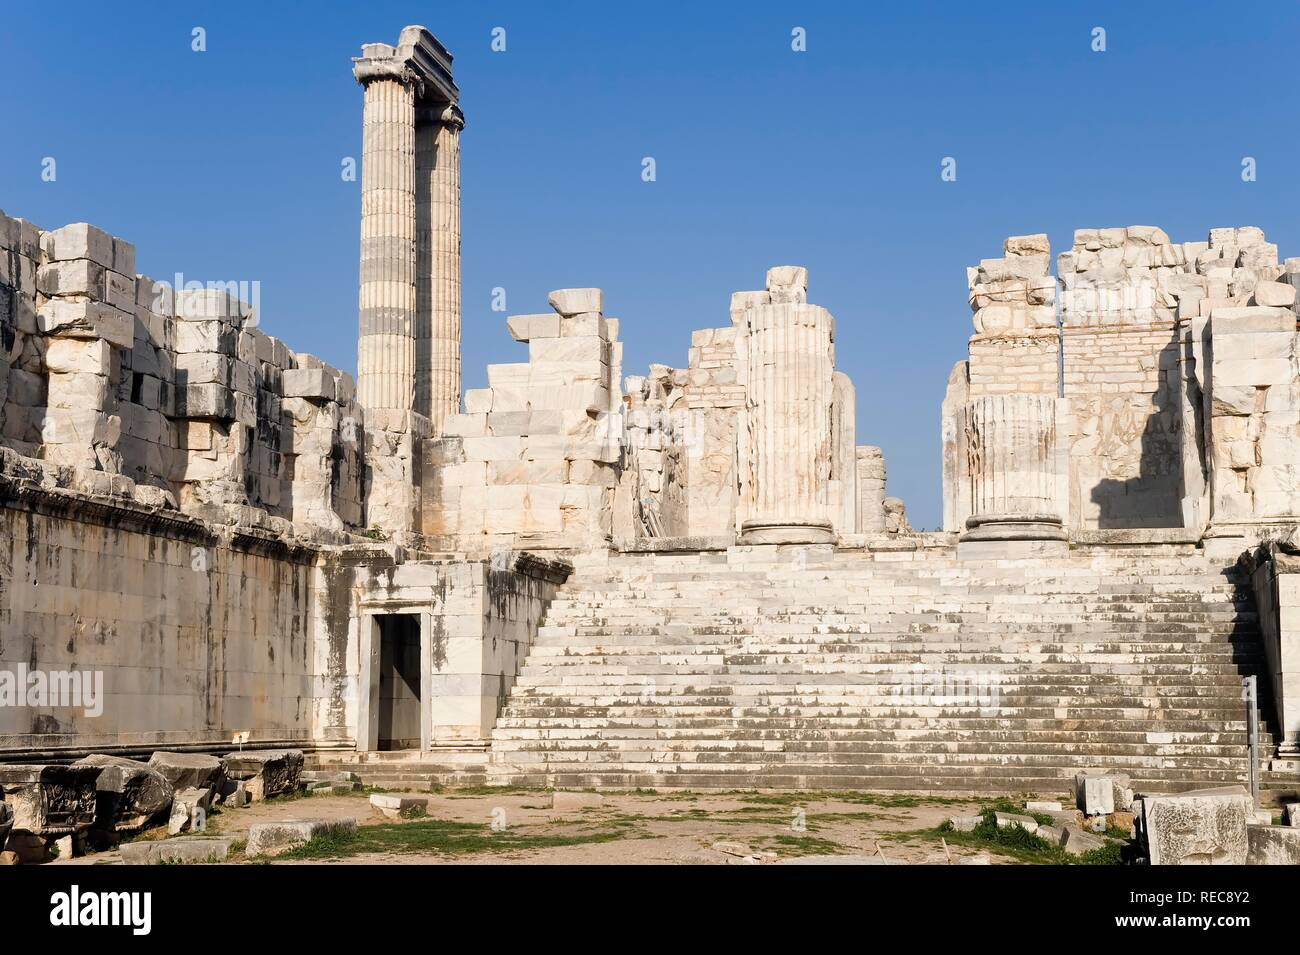 Apollo temple, inside lower court yard, Didyma, Turkey - Stock Image